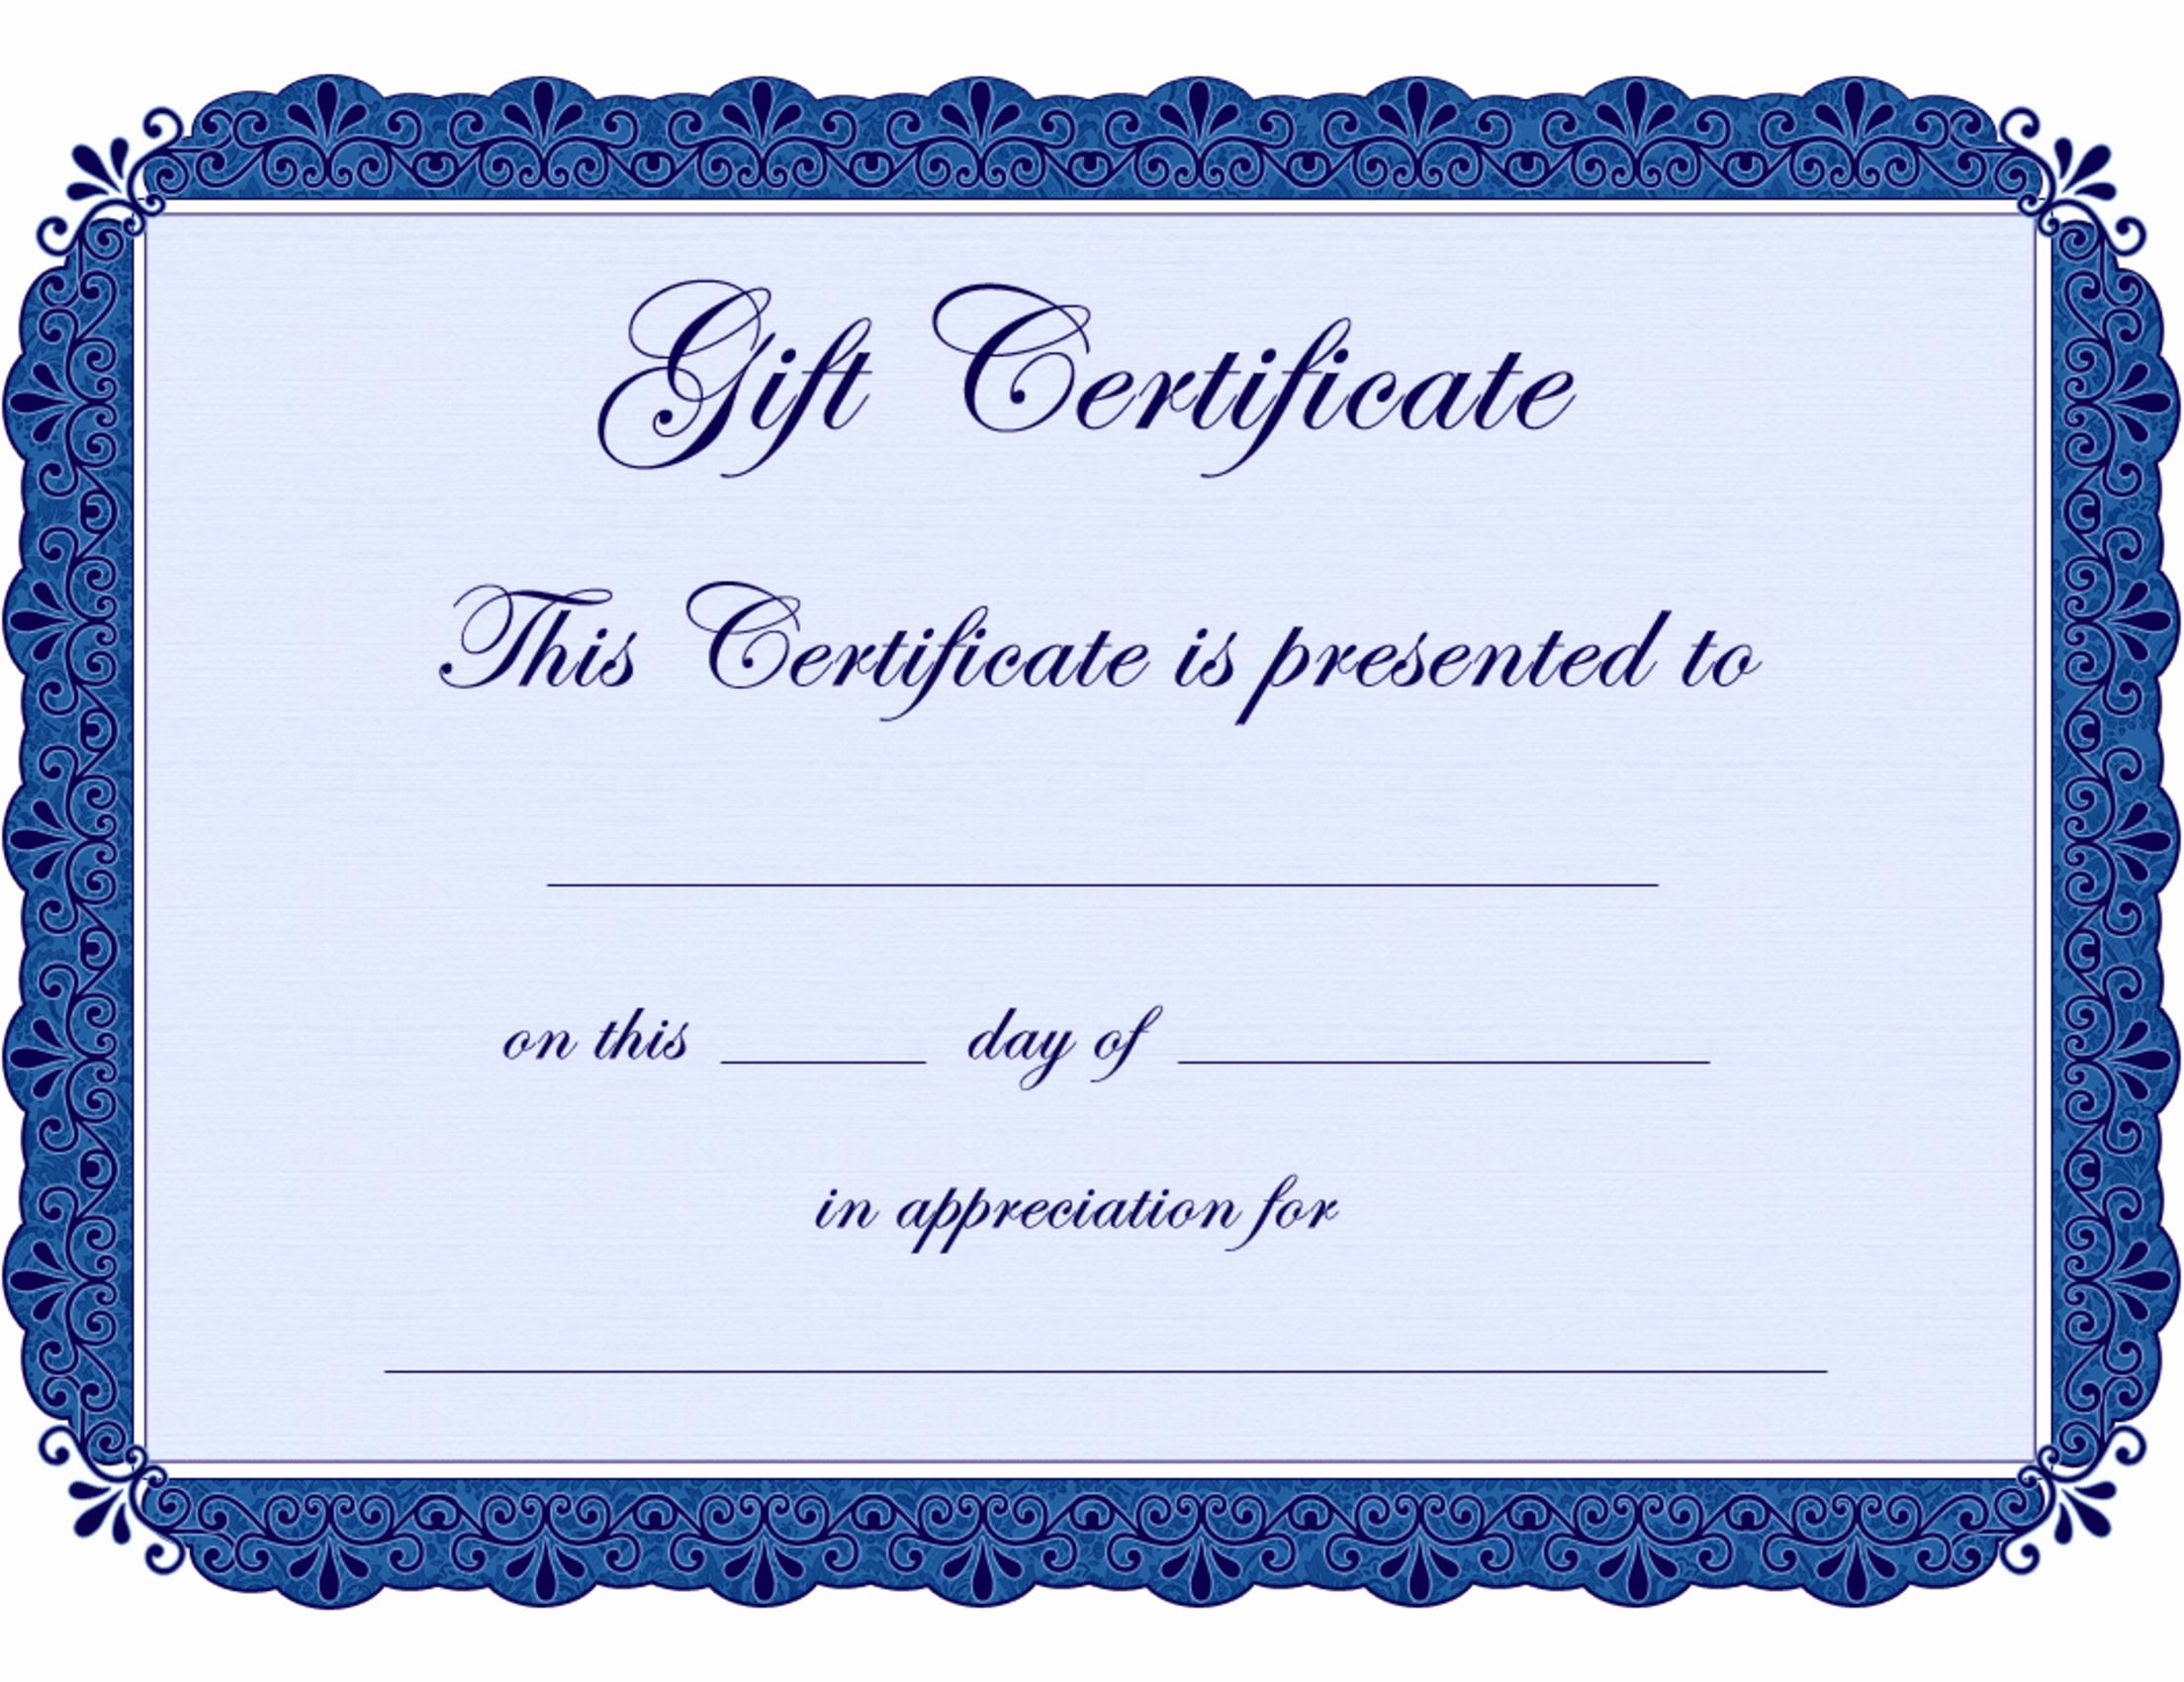 Microsoft Office Award Certificate Template Unique Gift Certificate Templates Microsoft Fice Templates